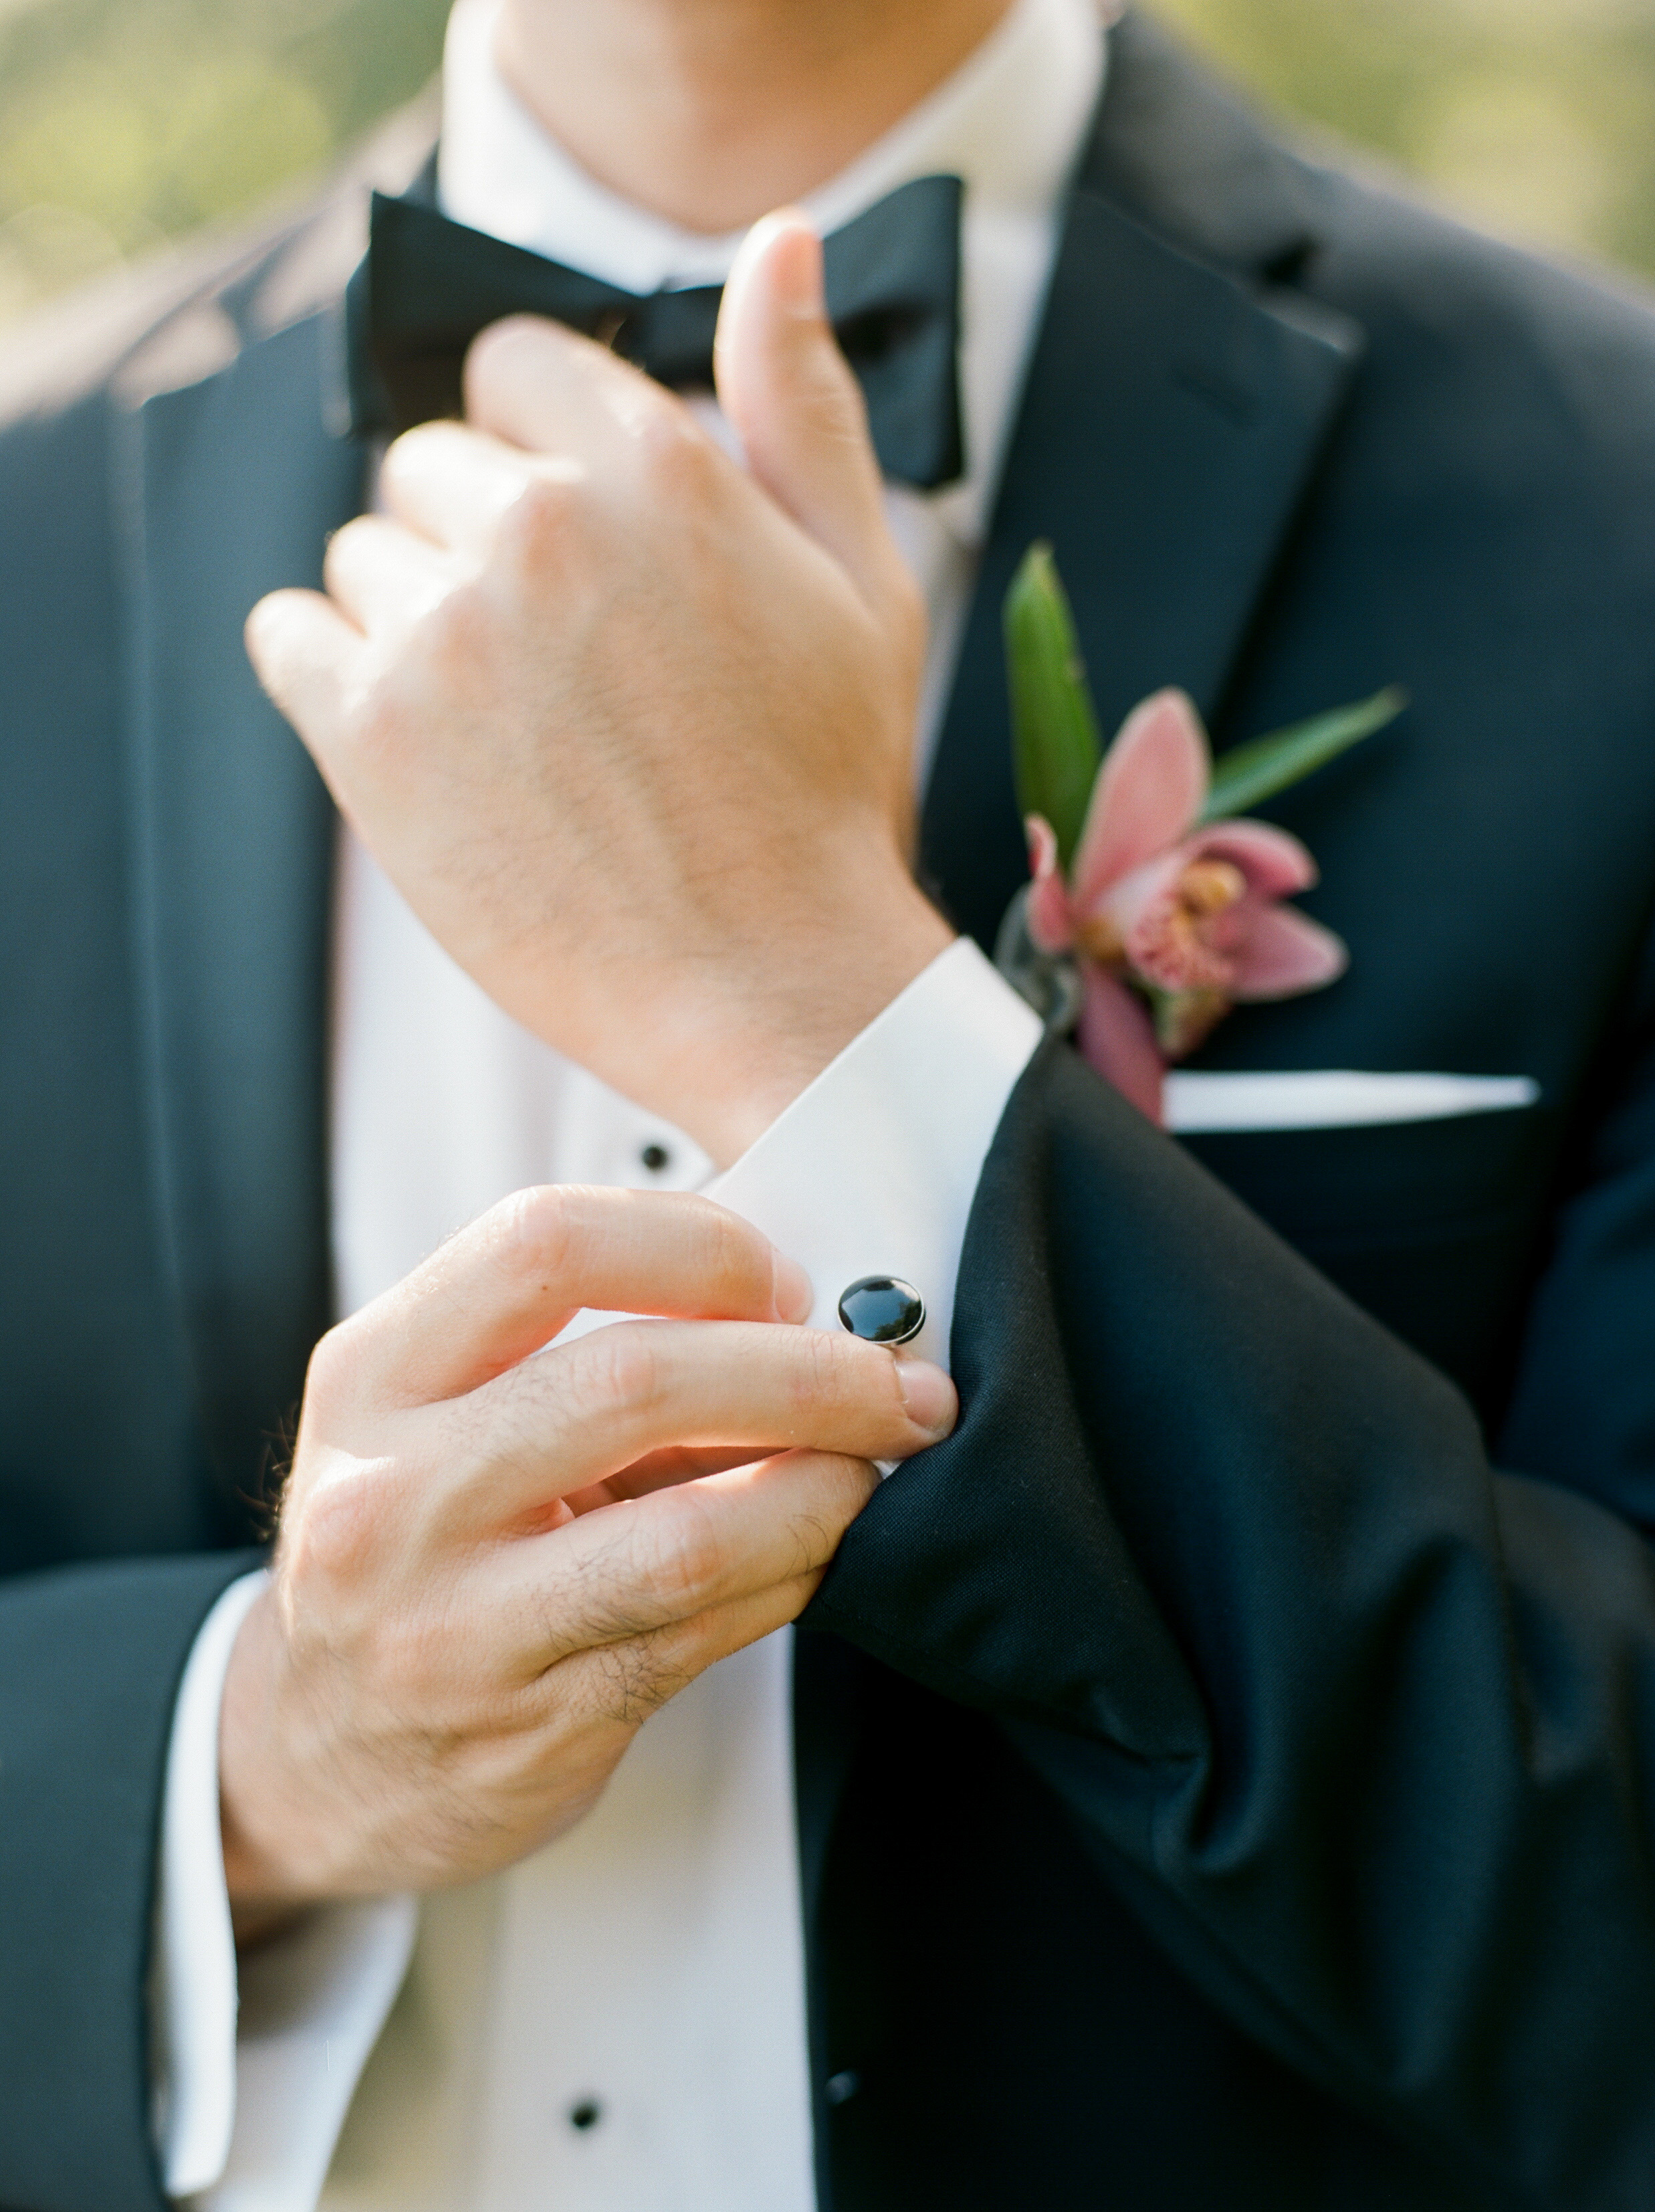 The-Knot-Texas-Magazine-Wedding-Top-Best-Houston-Wedding-Photographer-Fine-Art-Film-Dana-Fernandez-Photography-103.jpg